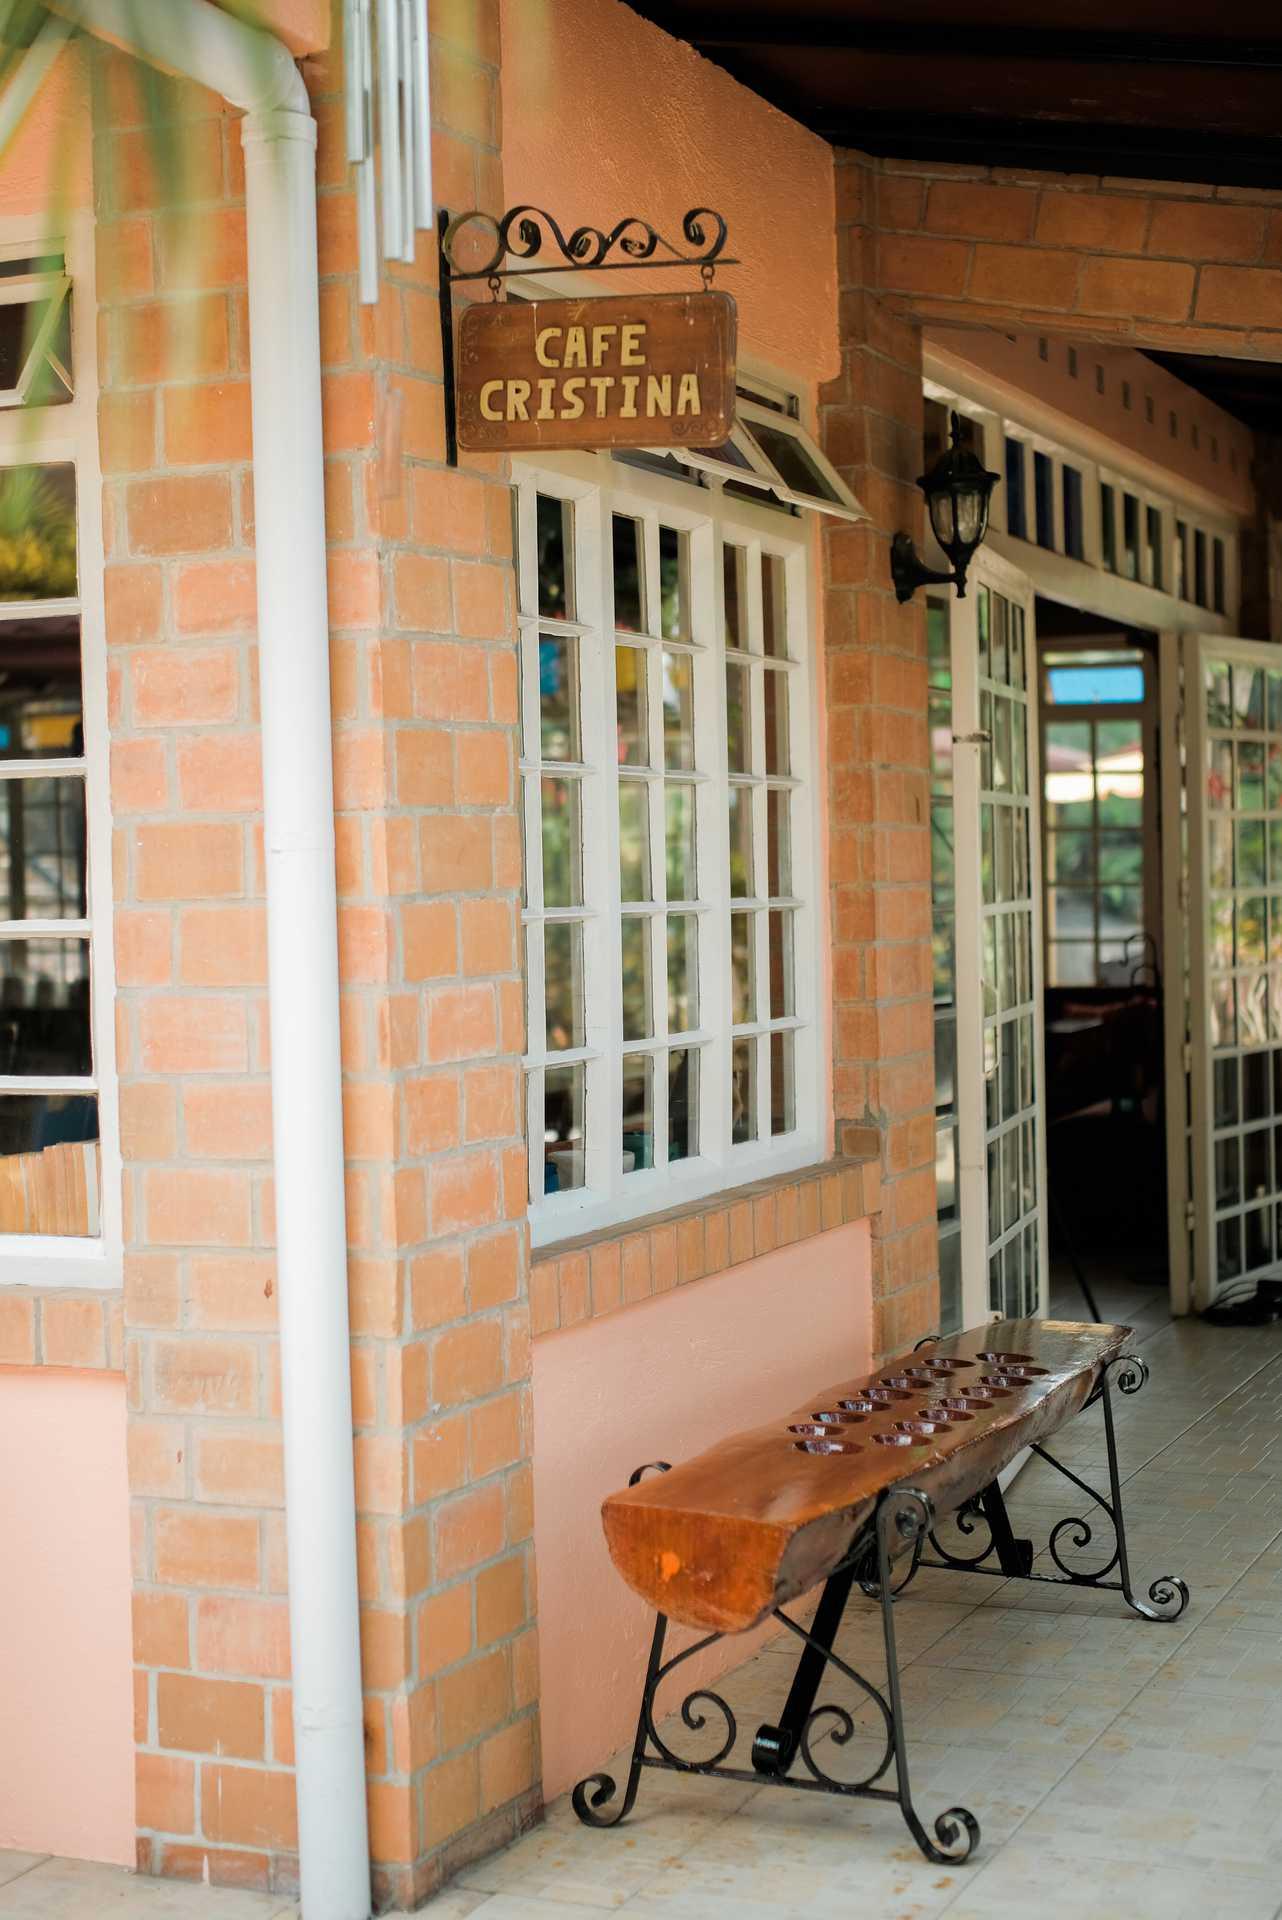 Cafe Cristina 2